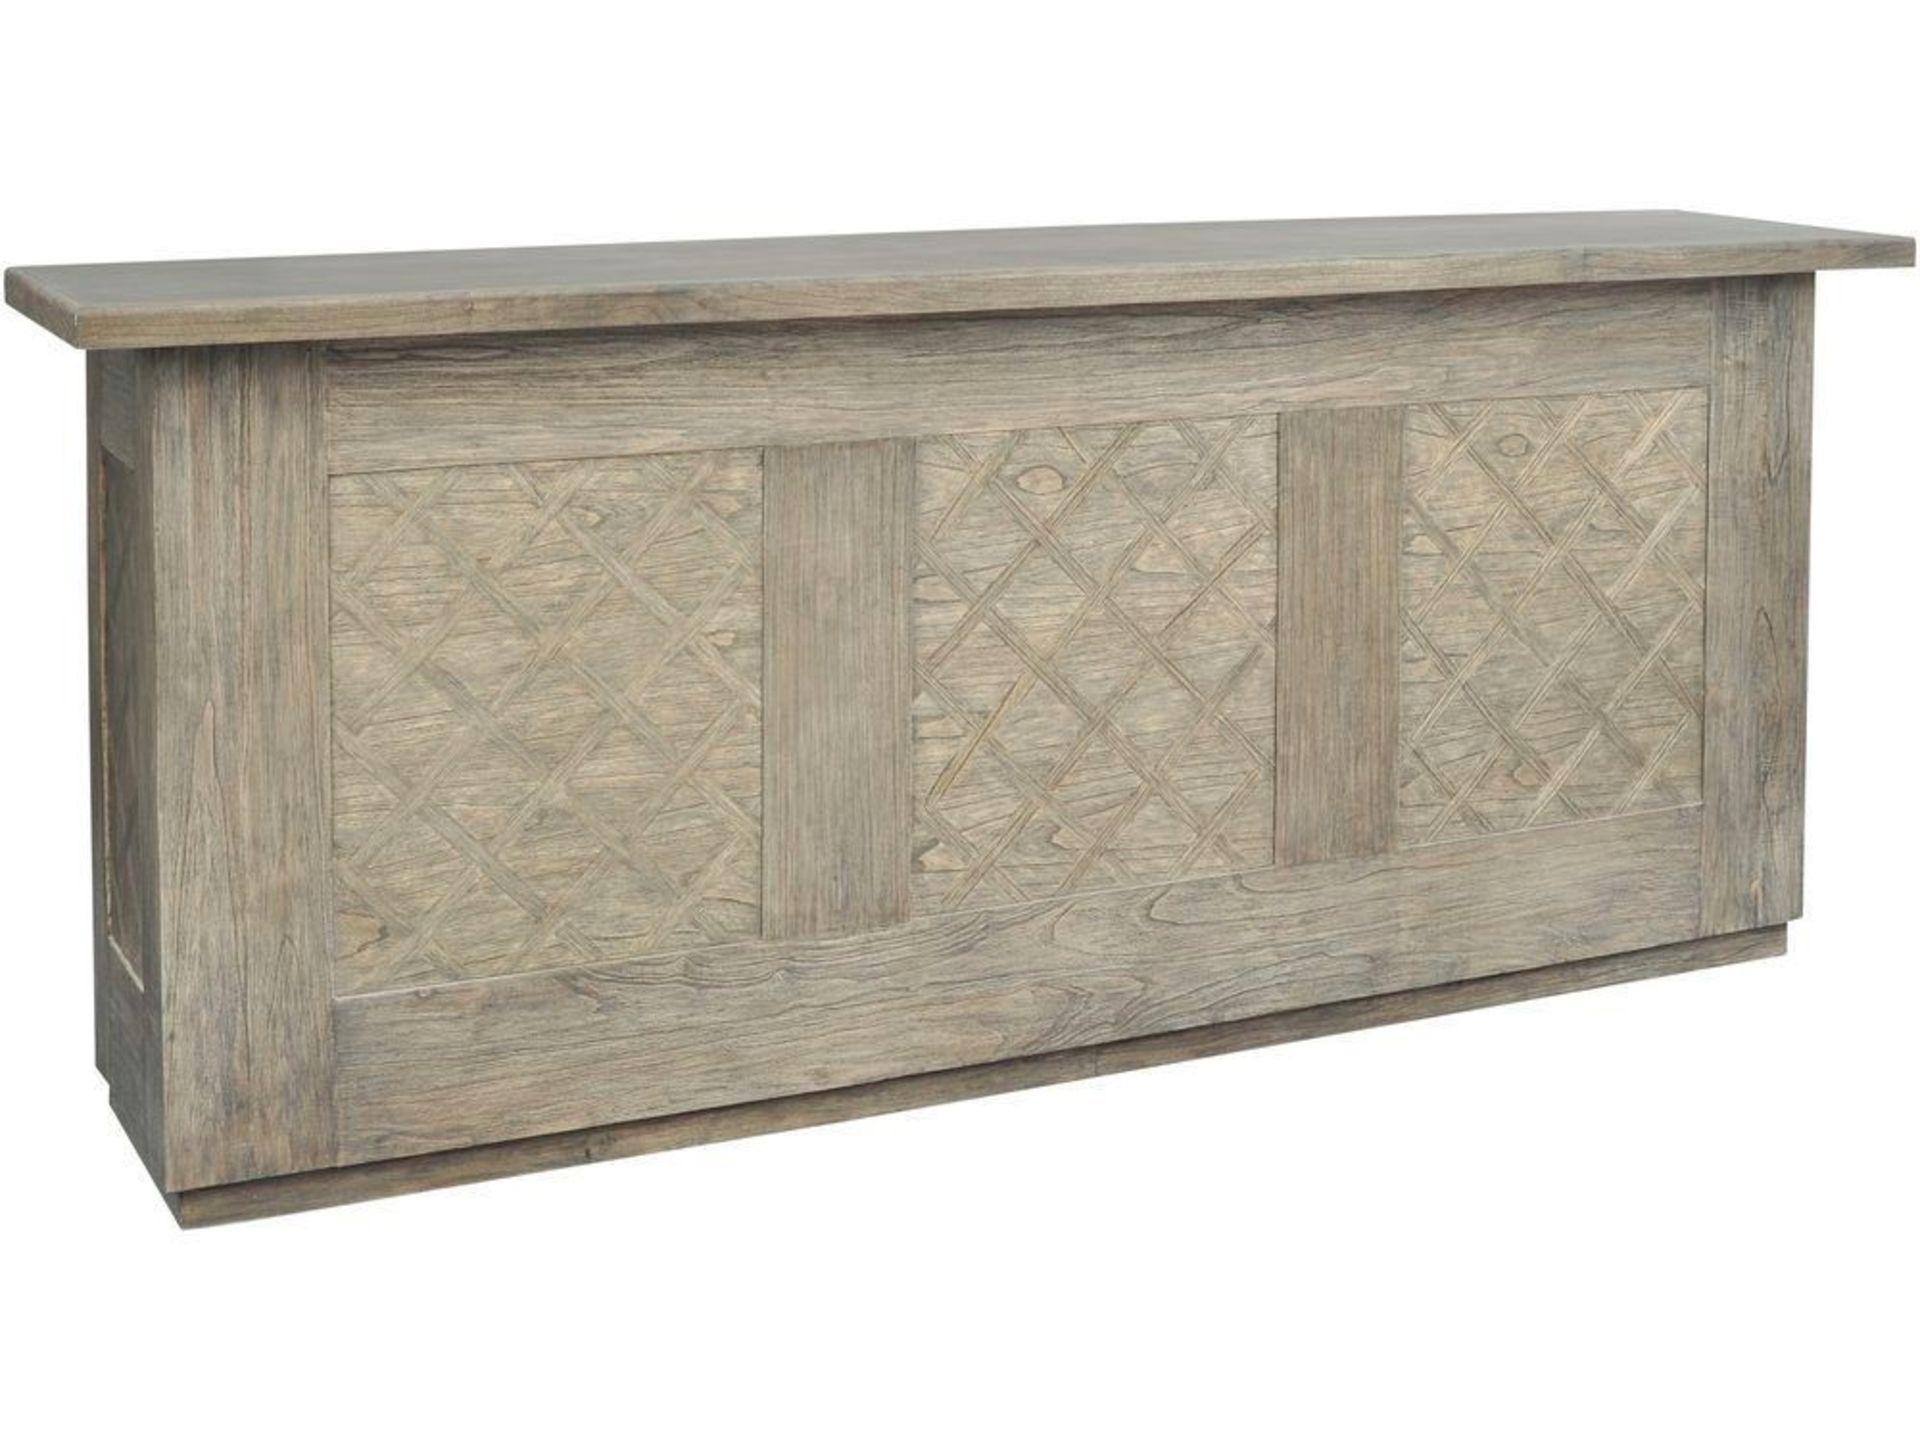 Lot 1074 - Fairmont Washed Wood Freestanding Bar